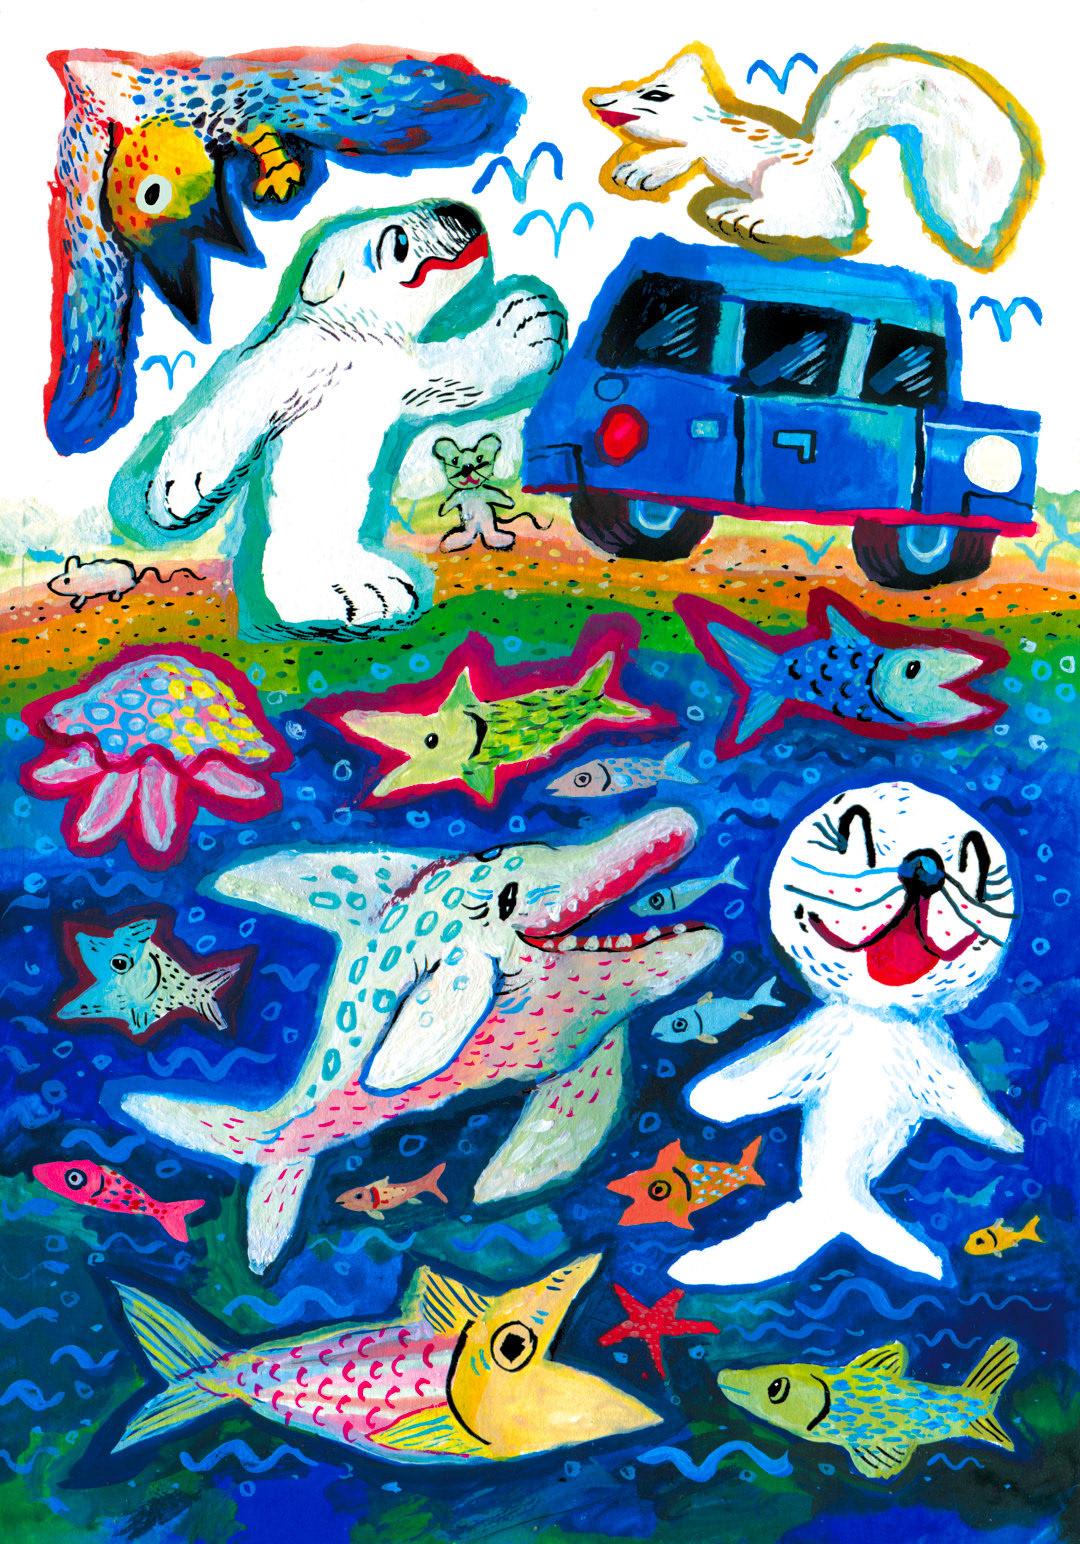 animal characters animal stickers Comic Book merchendise Sticker Design sticker sheet UV Stickers children's illustration